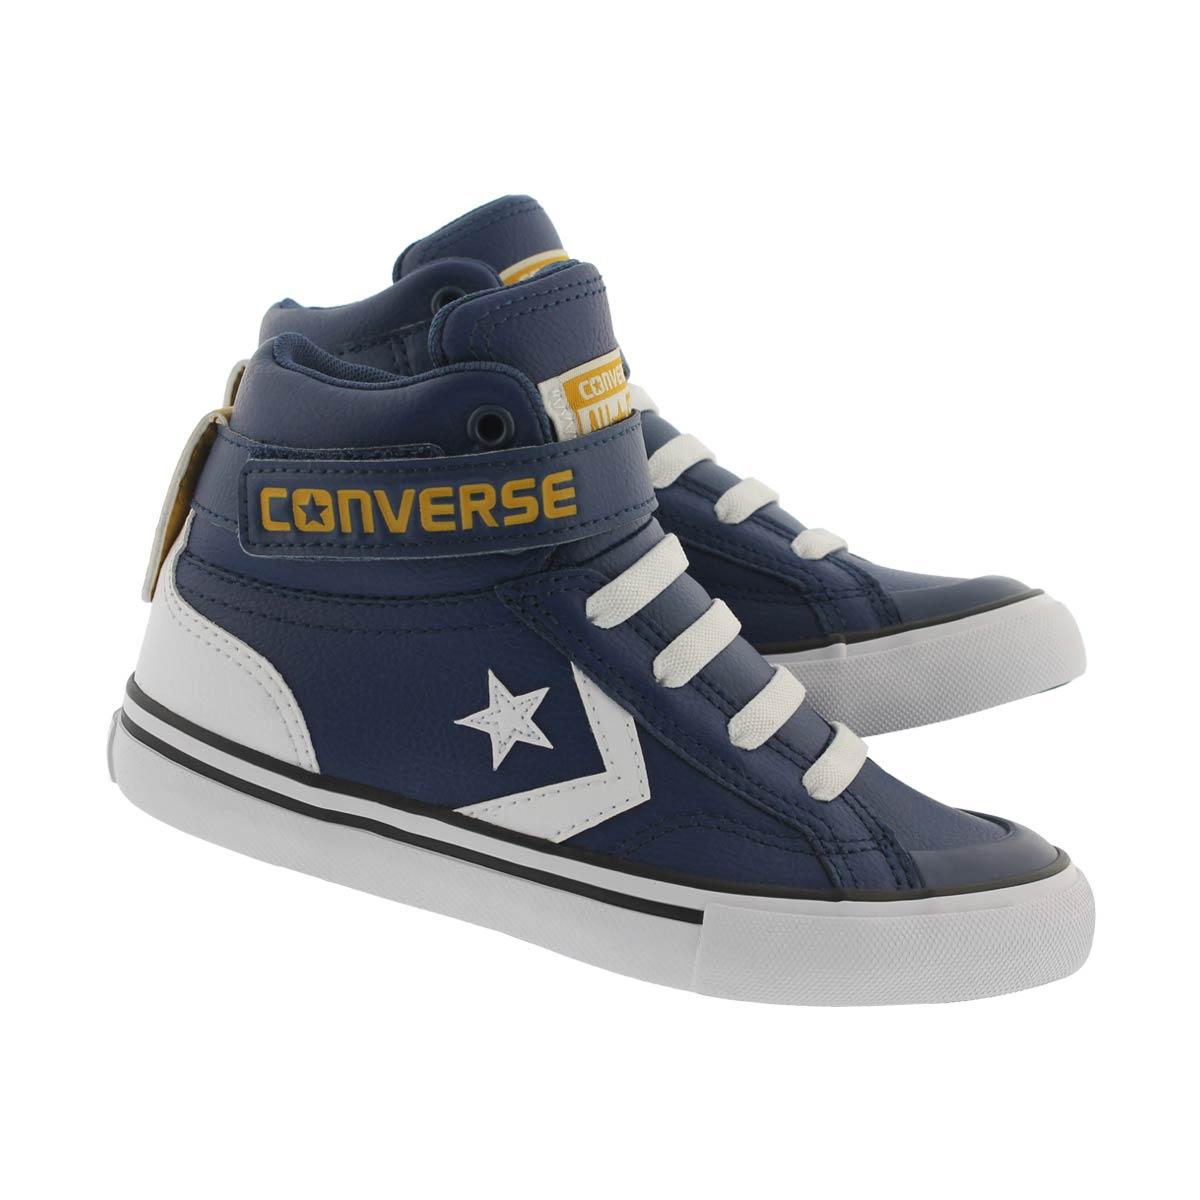 Bys Pro Blaze Hi nvy/wht/yellow sneaker